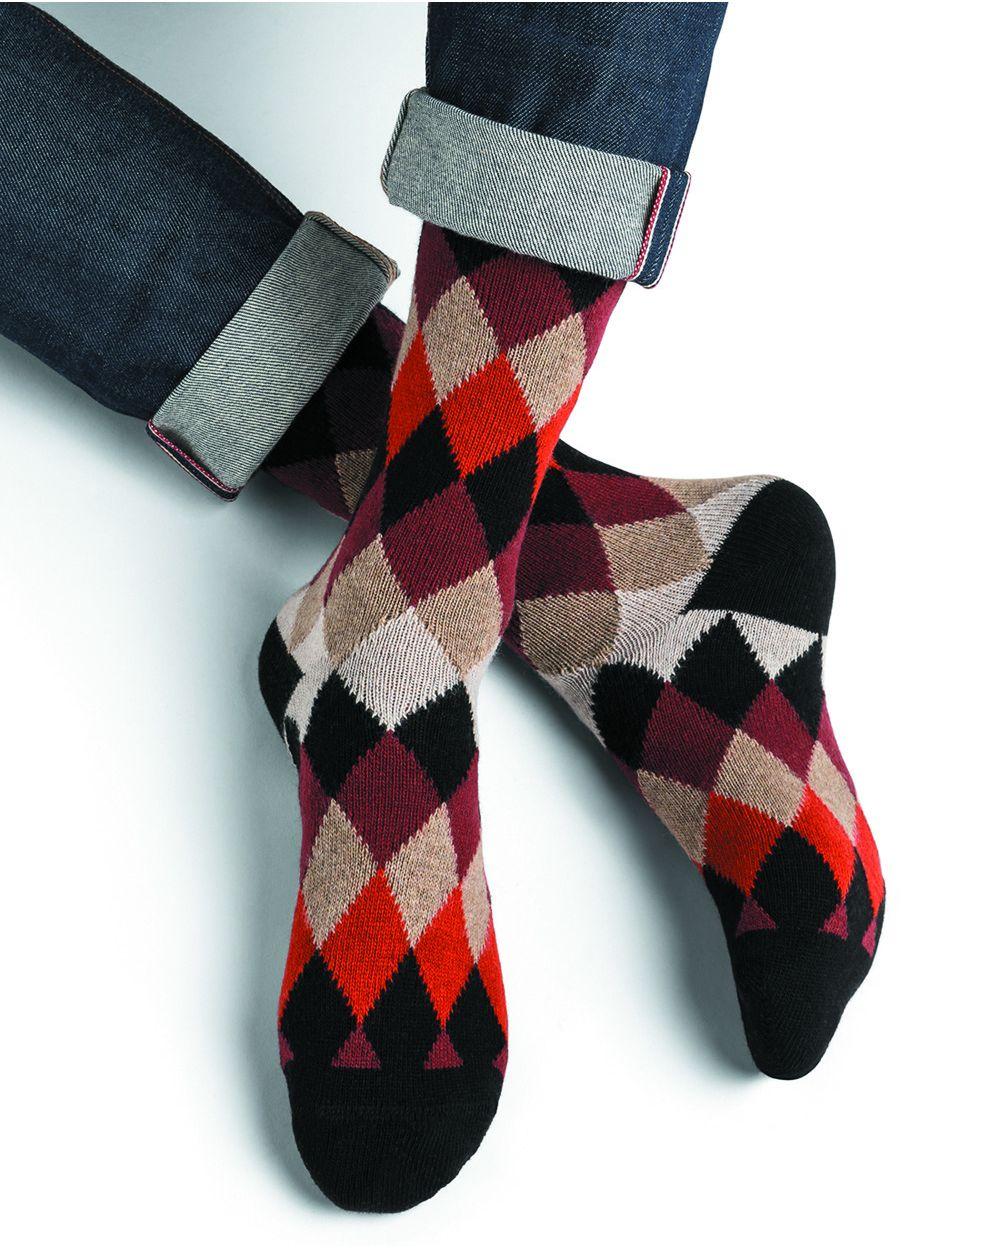 Argyle pattern cashmere wool socks